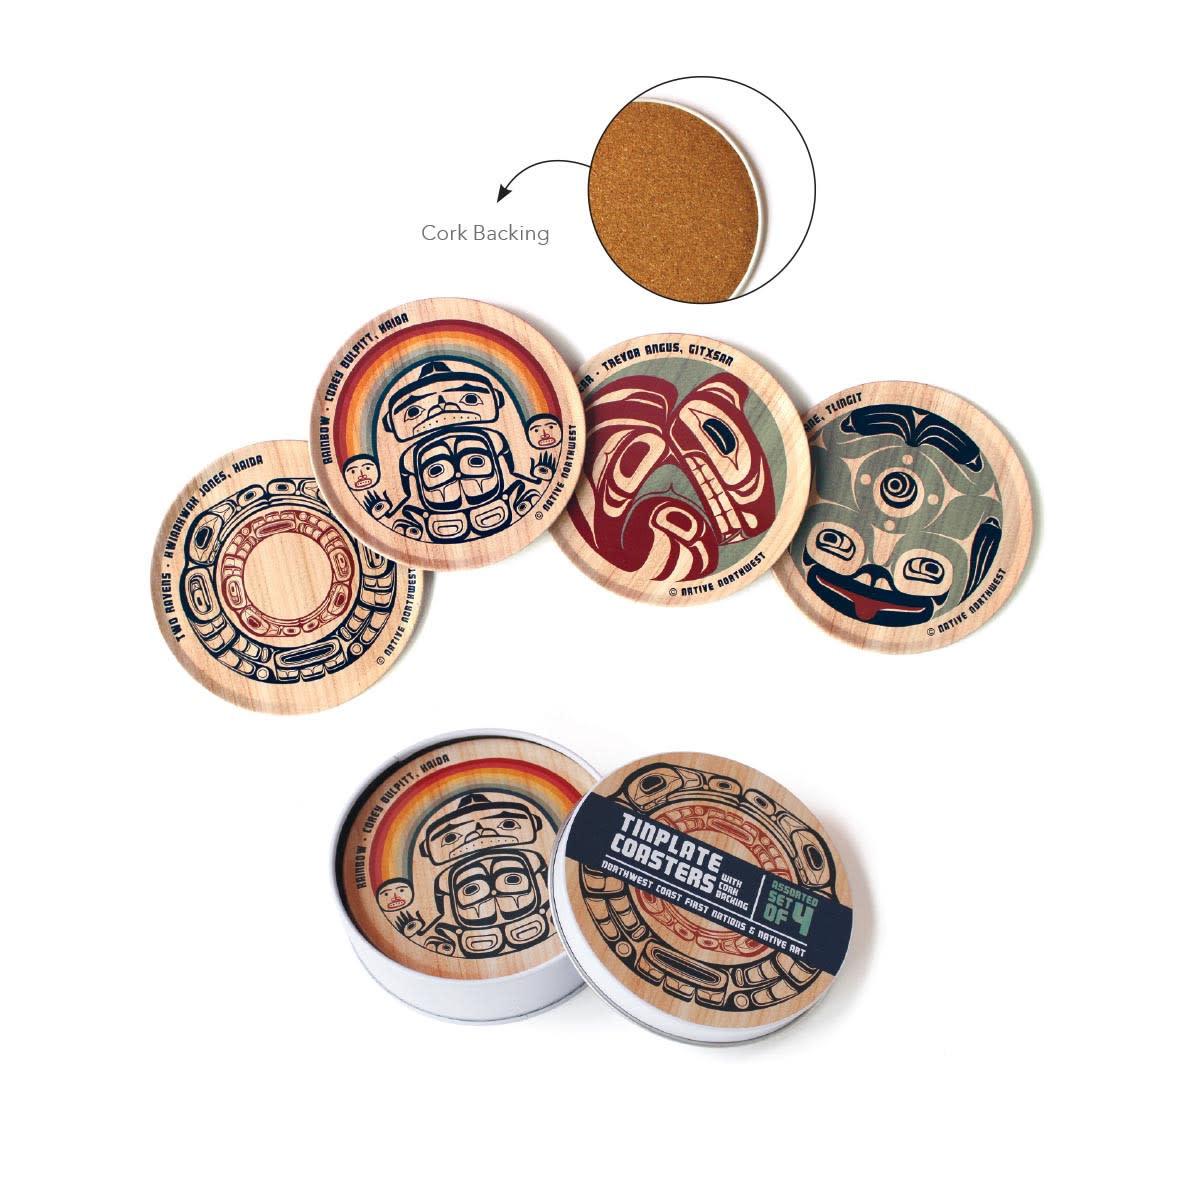 Tin Plate Coaster Set - Assorted set of 4-1